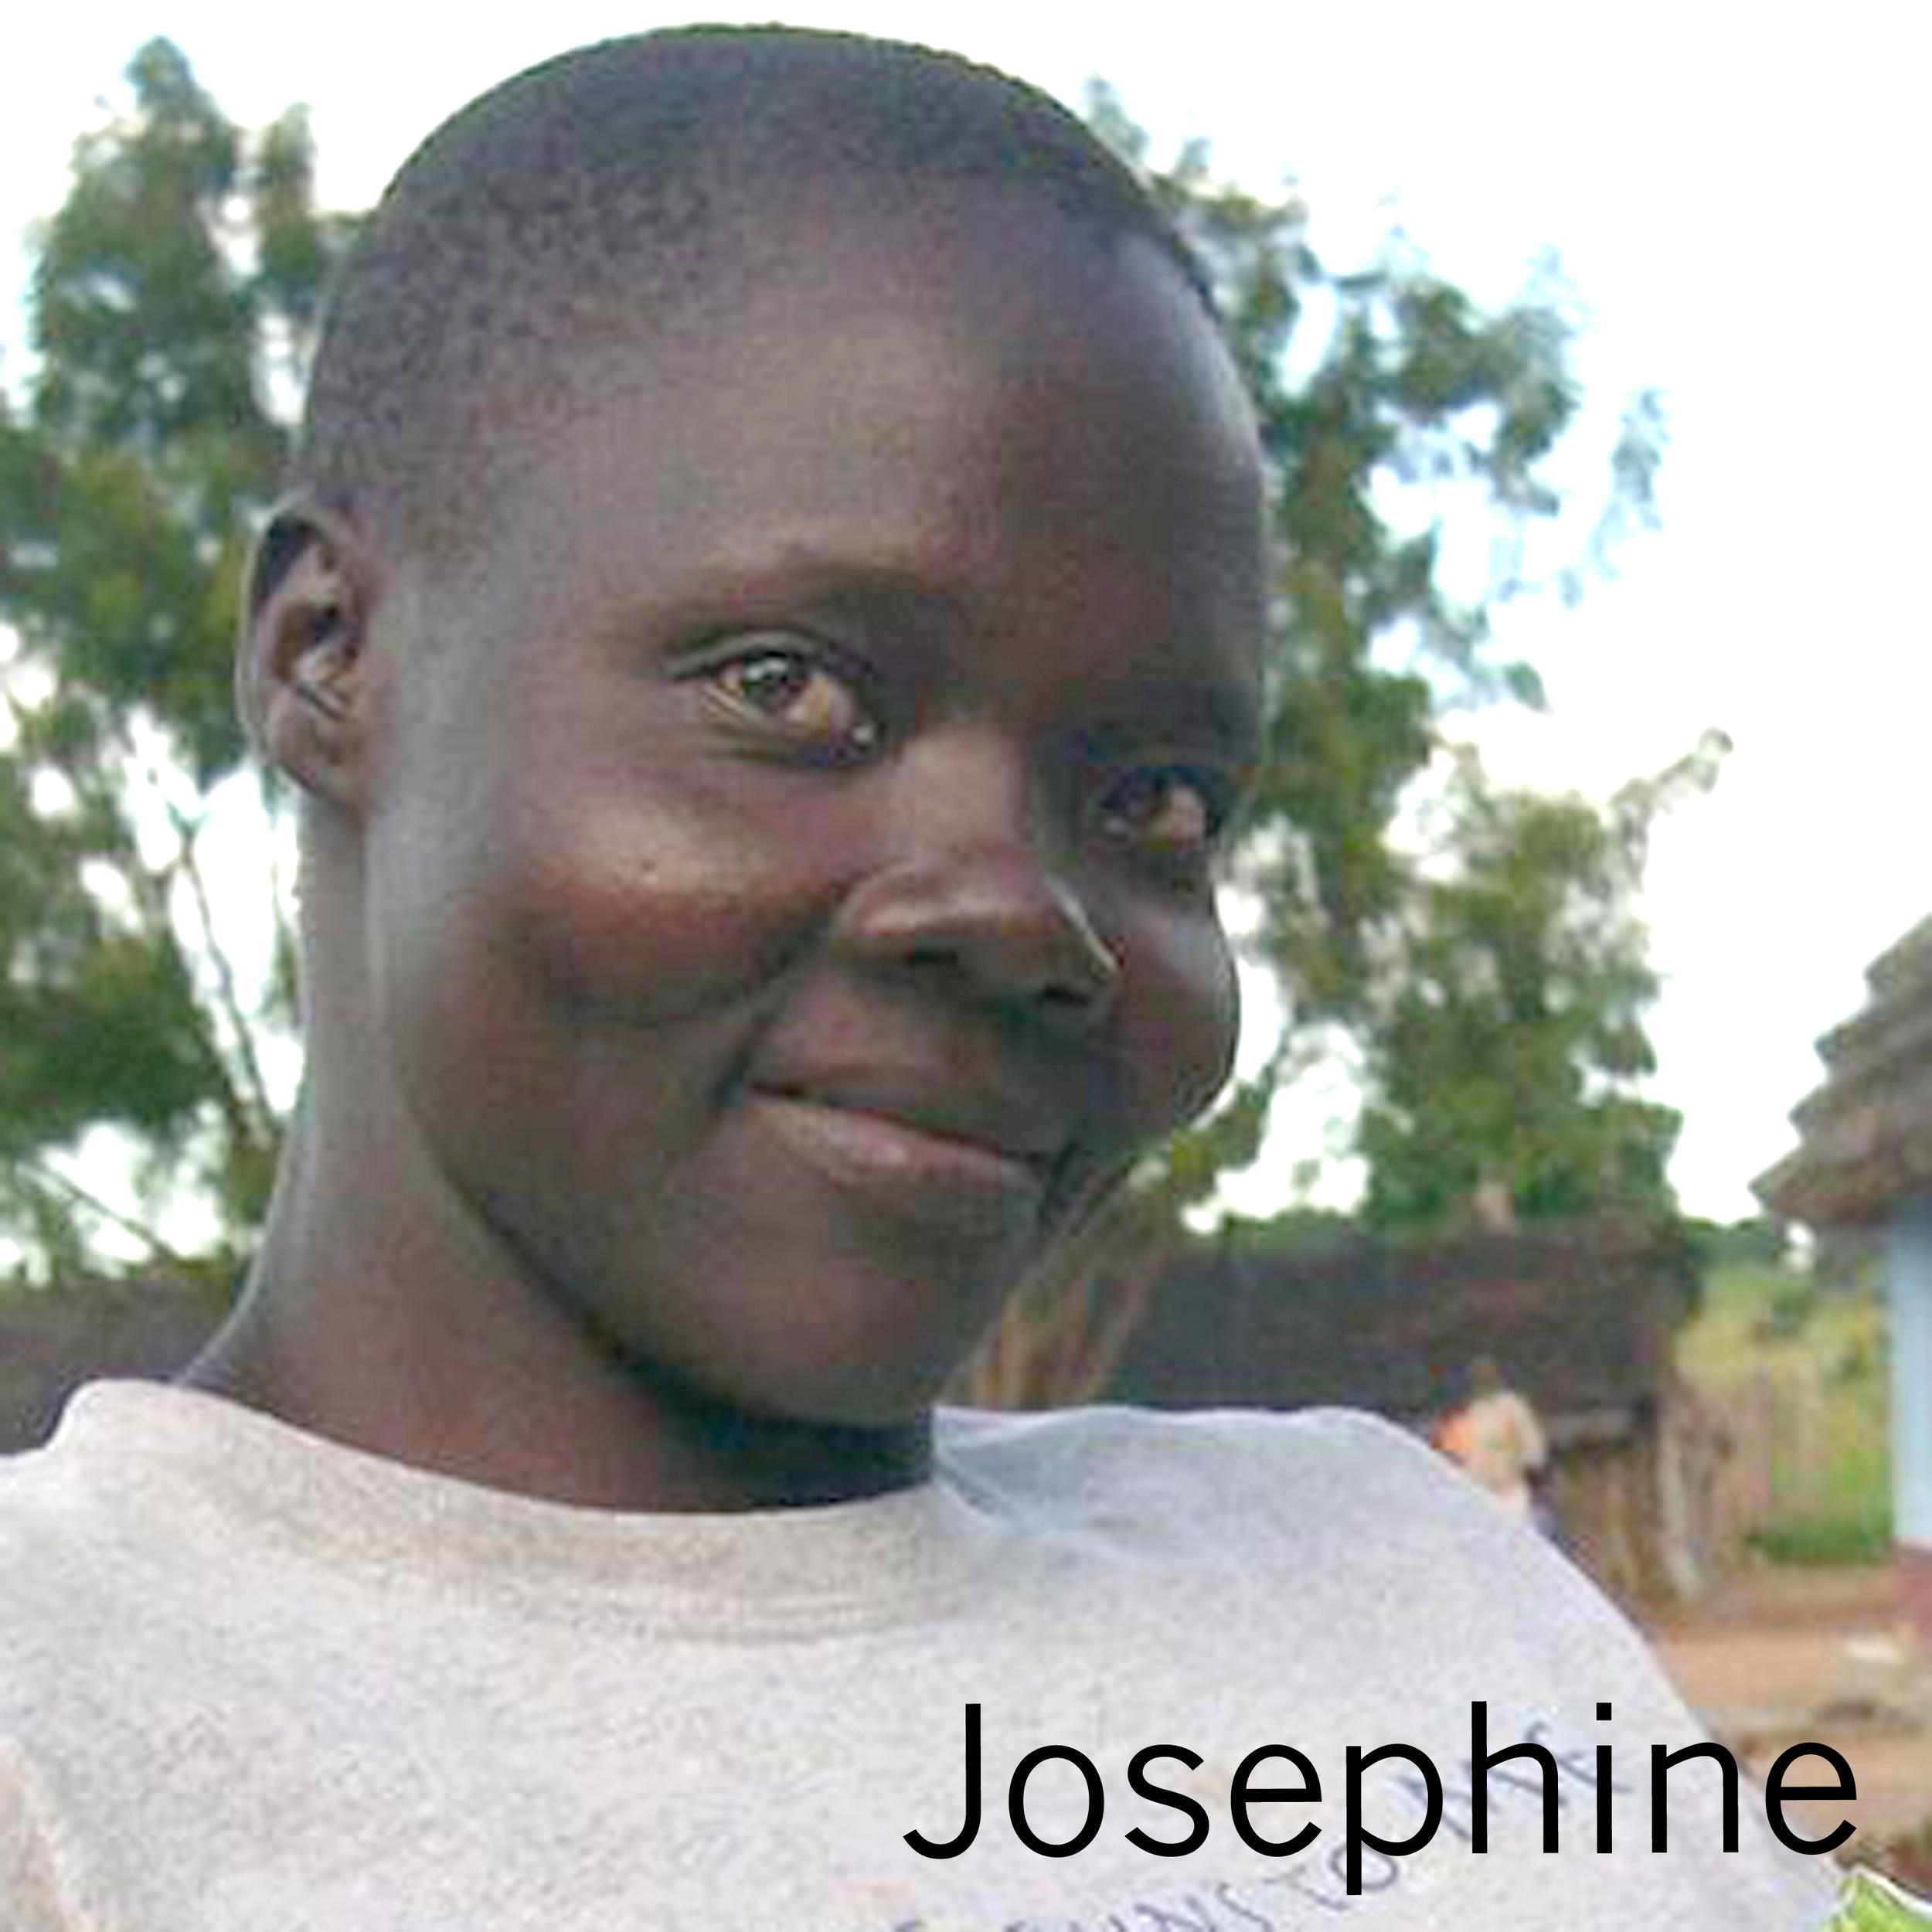 Josephine001_Name.jpg